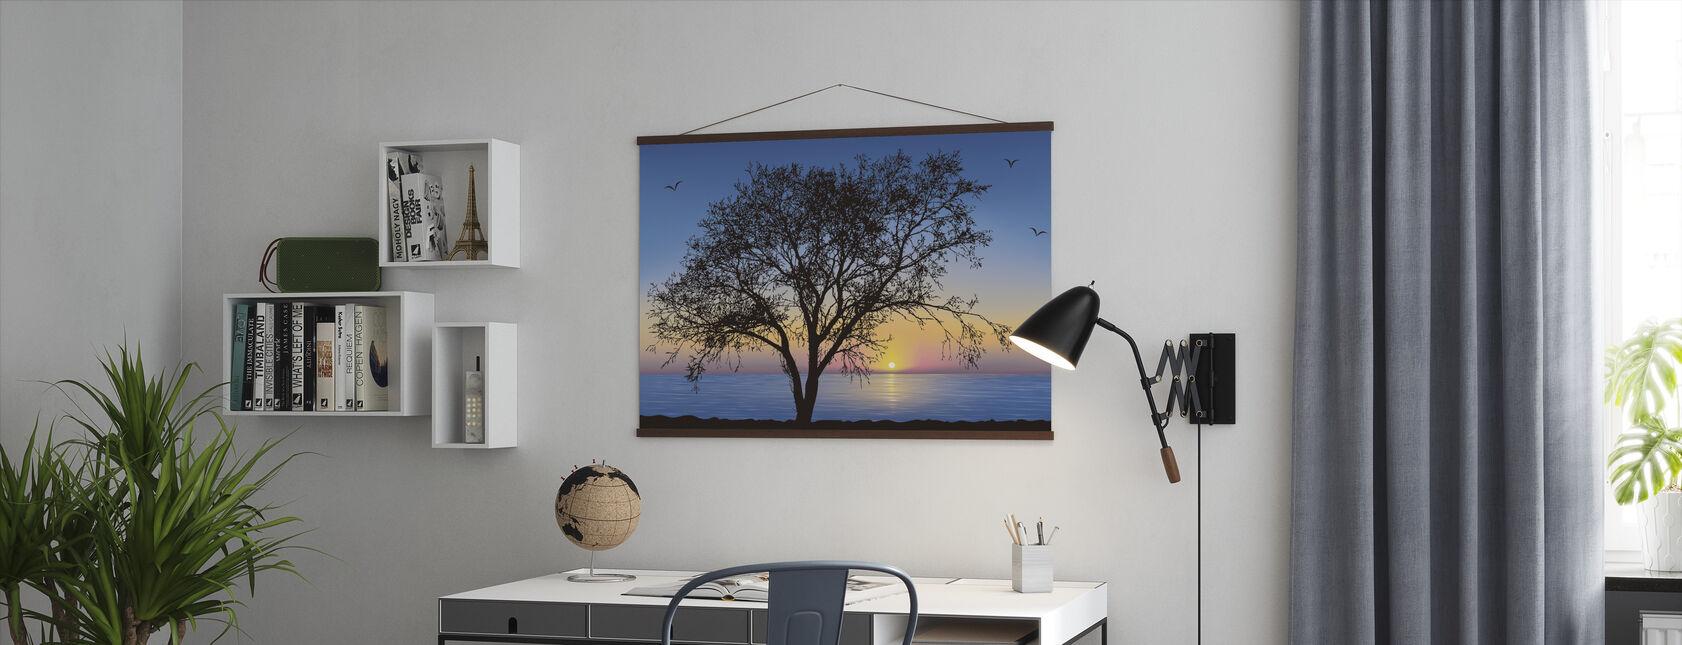 Boom Silhouet - Poster - Kantoor